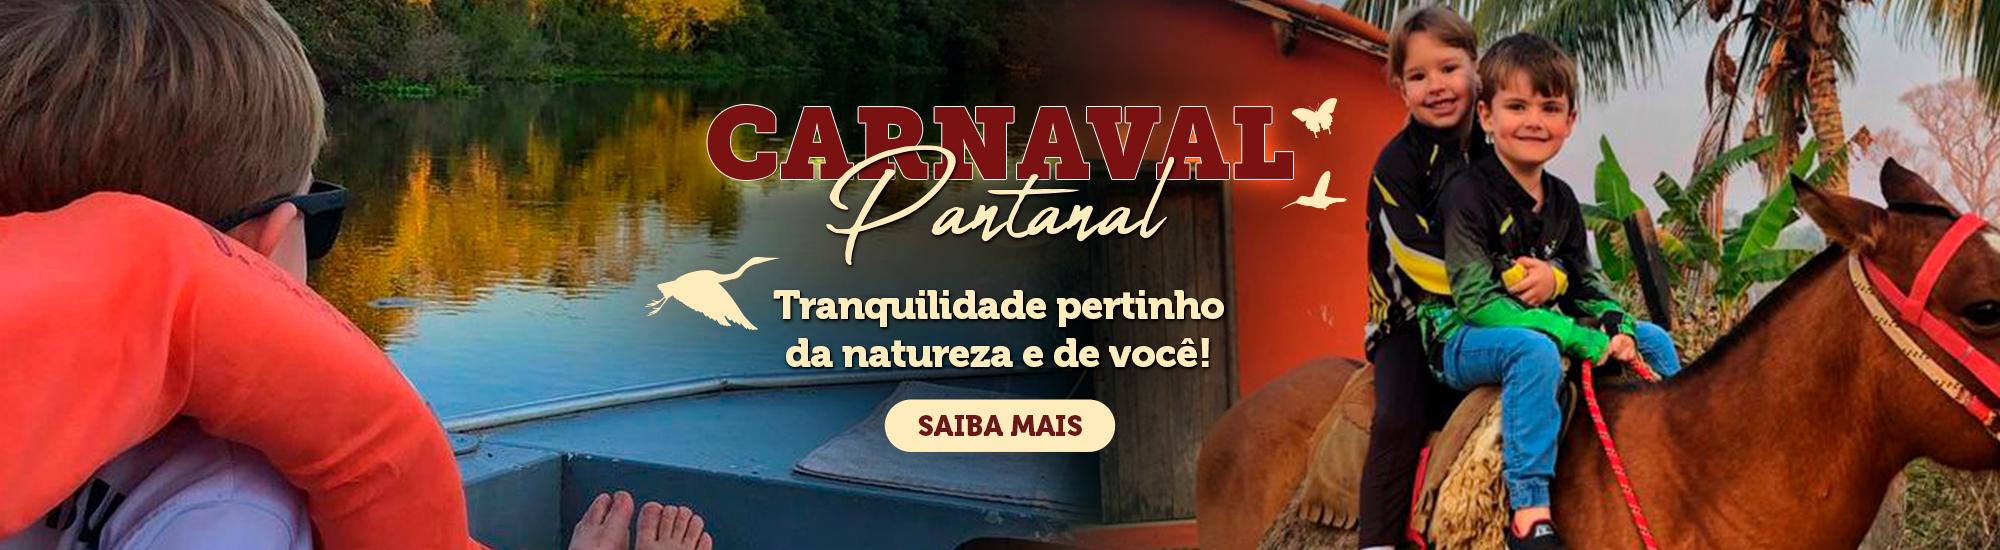 CARNAVAL PANTANAL MATO GROSSO HOTEL